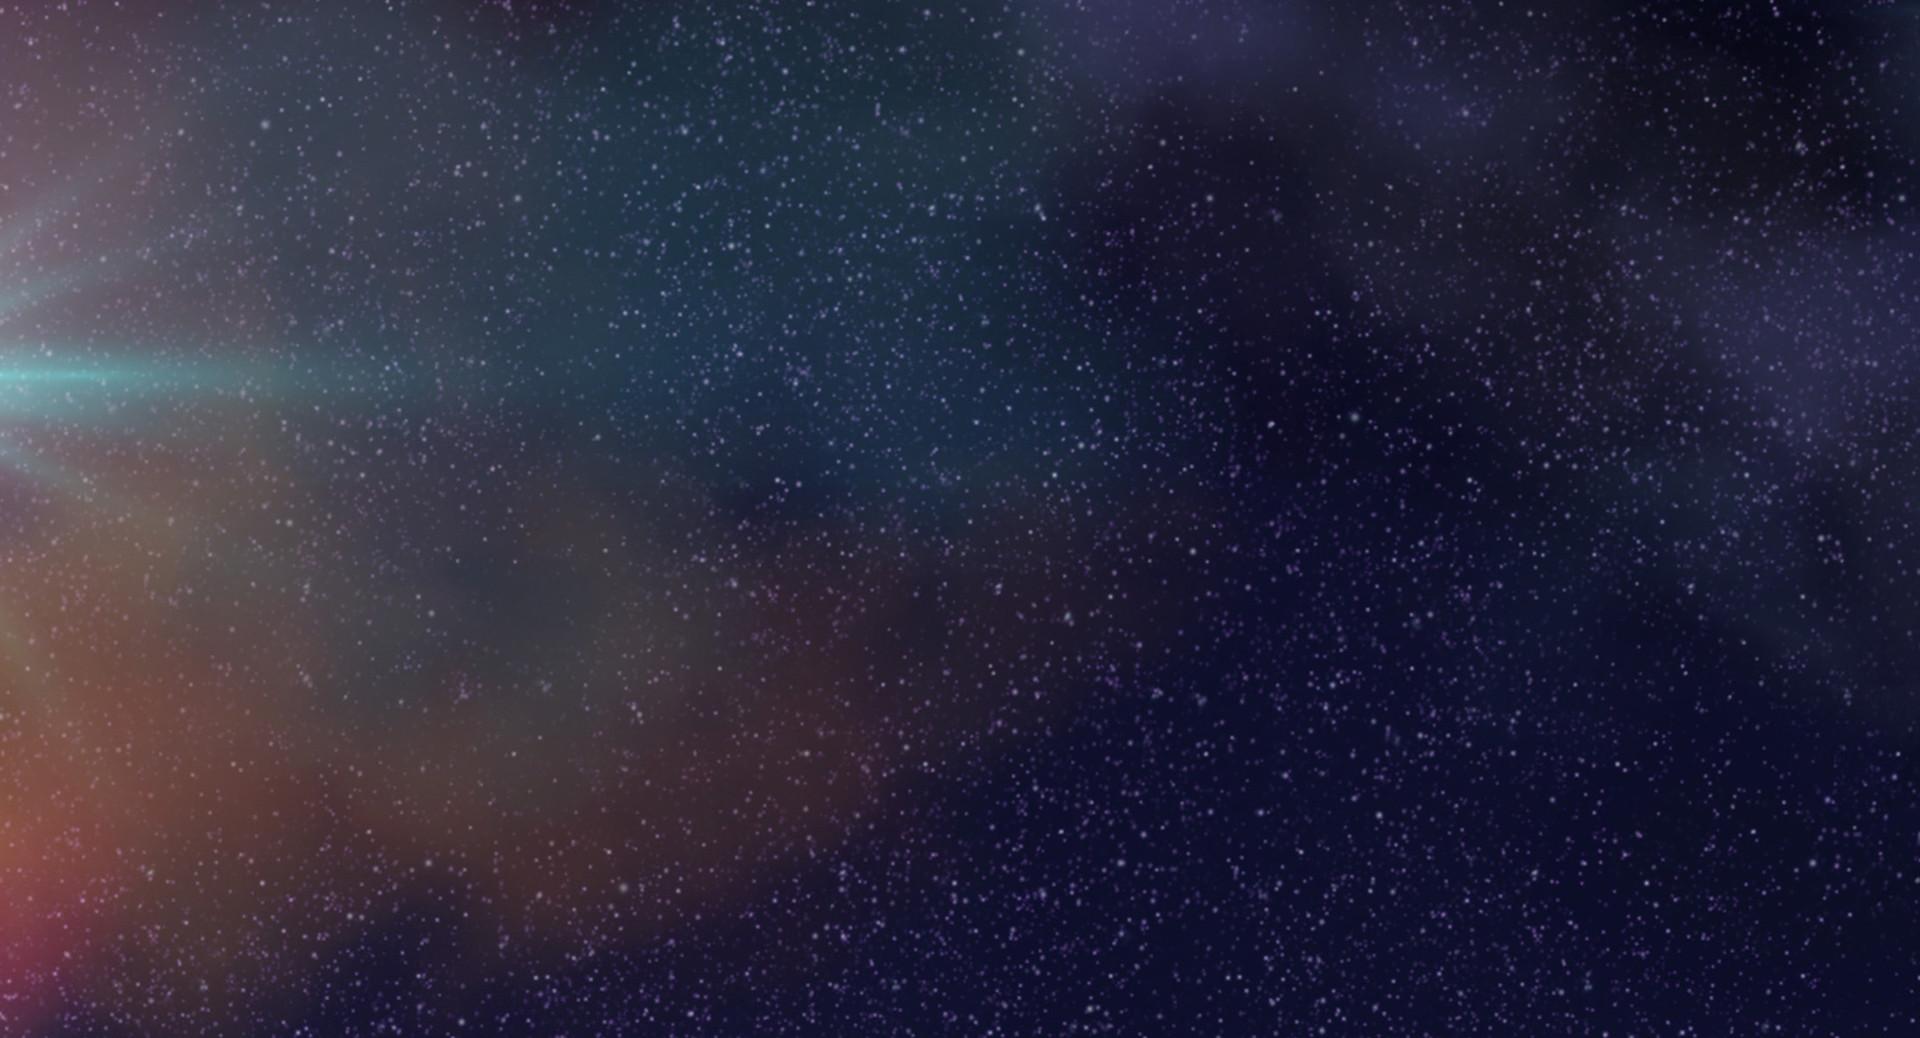 Phil saunders binarystar18